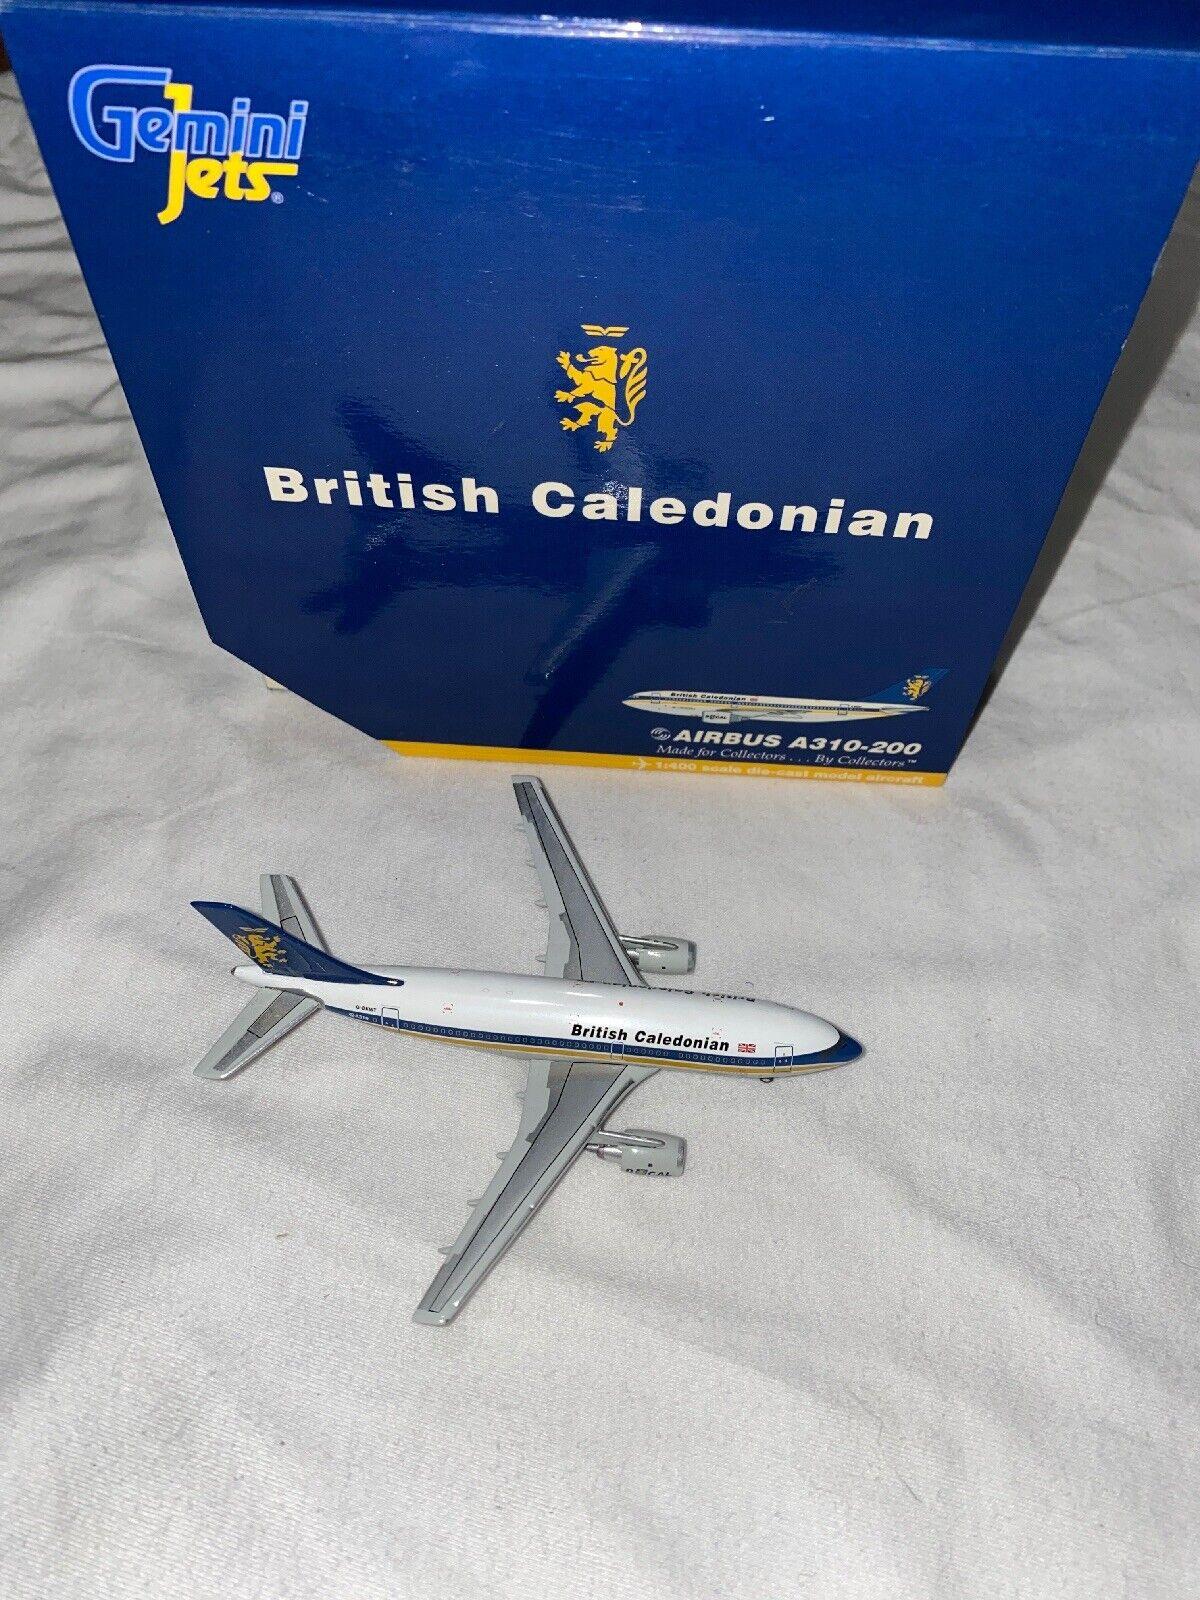 RARE Gemini Jets 1400 BRITISH CALEDONIAN AIRautobus A310200 modellolo Diecast gjbca 641